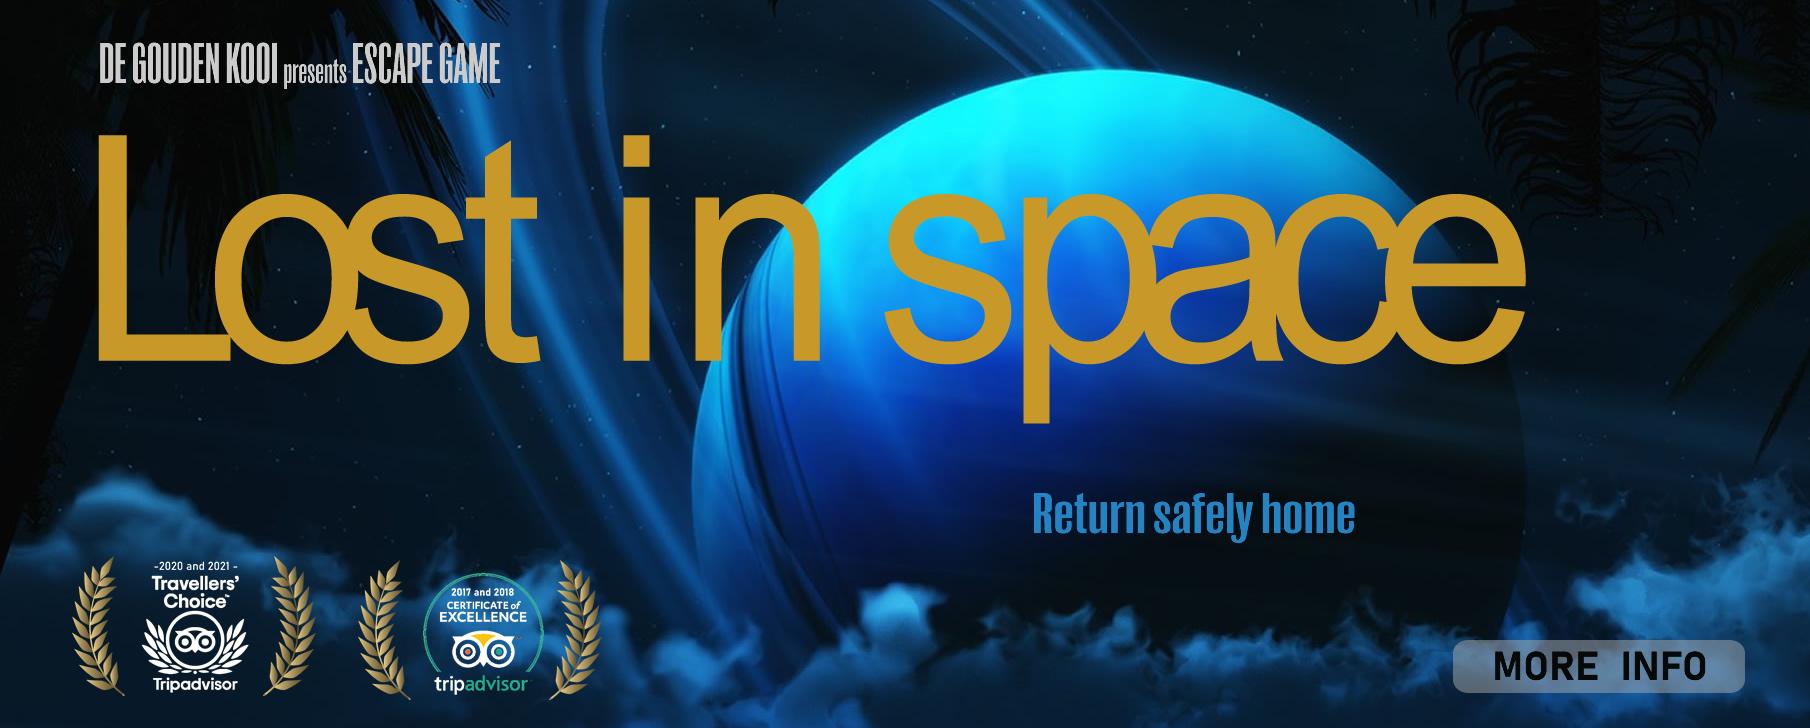 Escape game De Gouden Kooi - Lost in Space